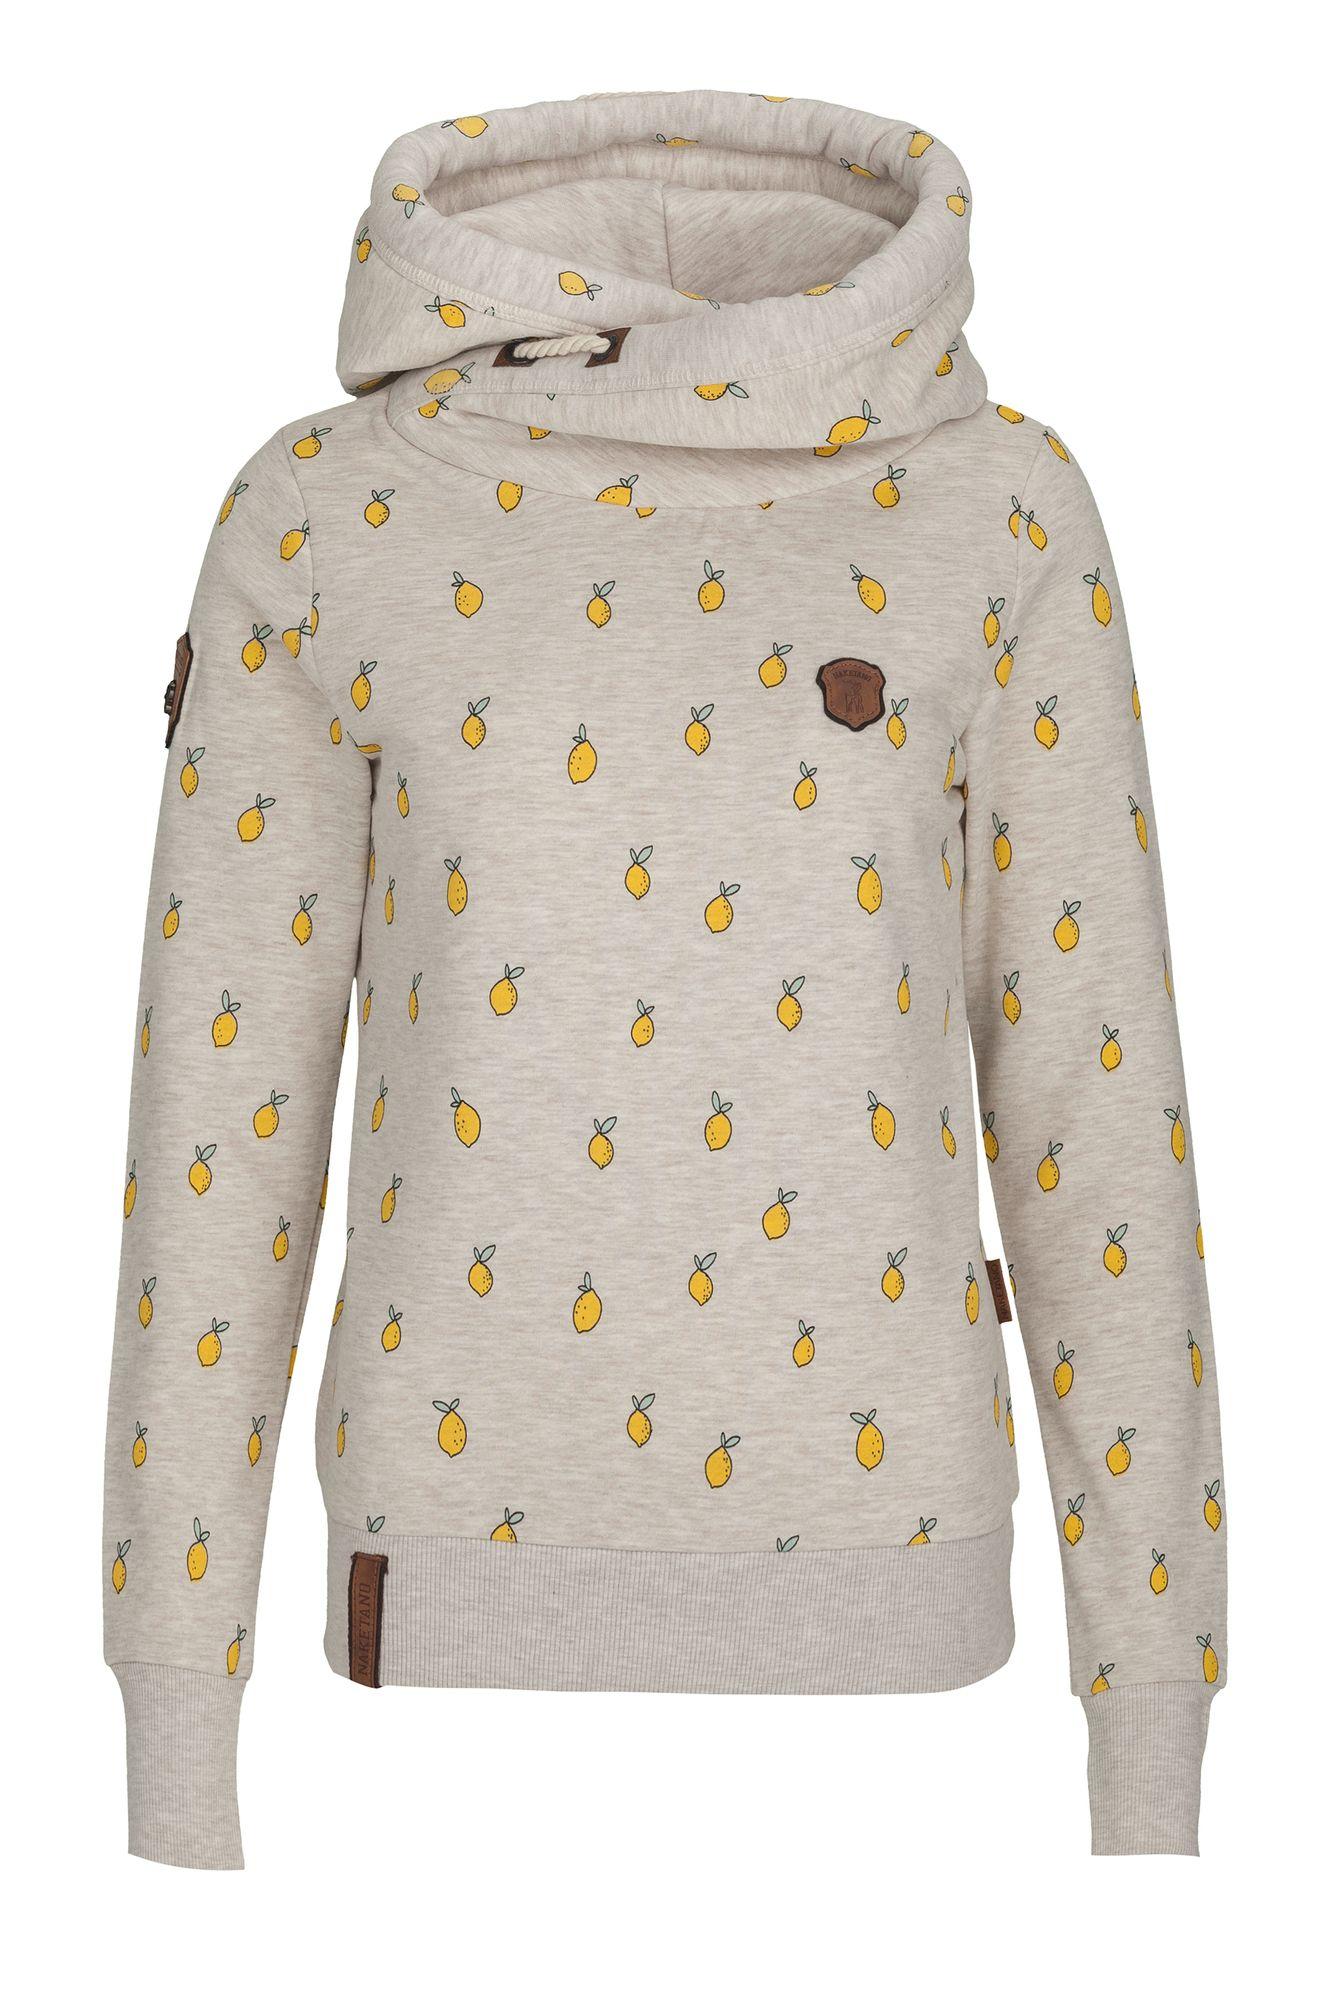 6695777d3b3673 I miss my friend Damen Kleidung Sweatshirts & Co Kapuzenpullover